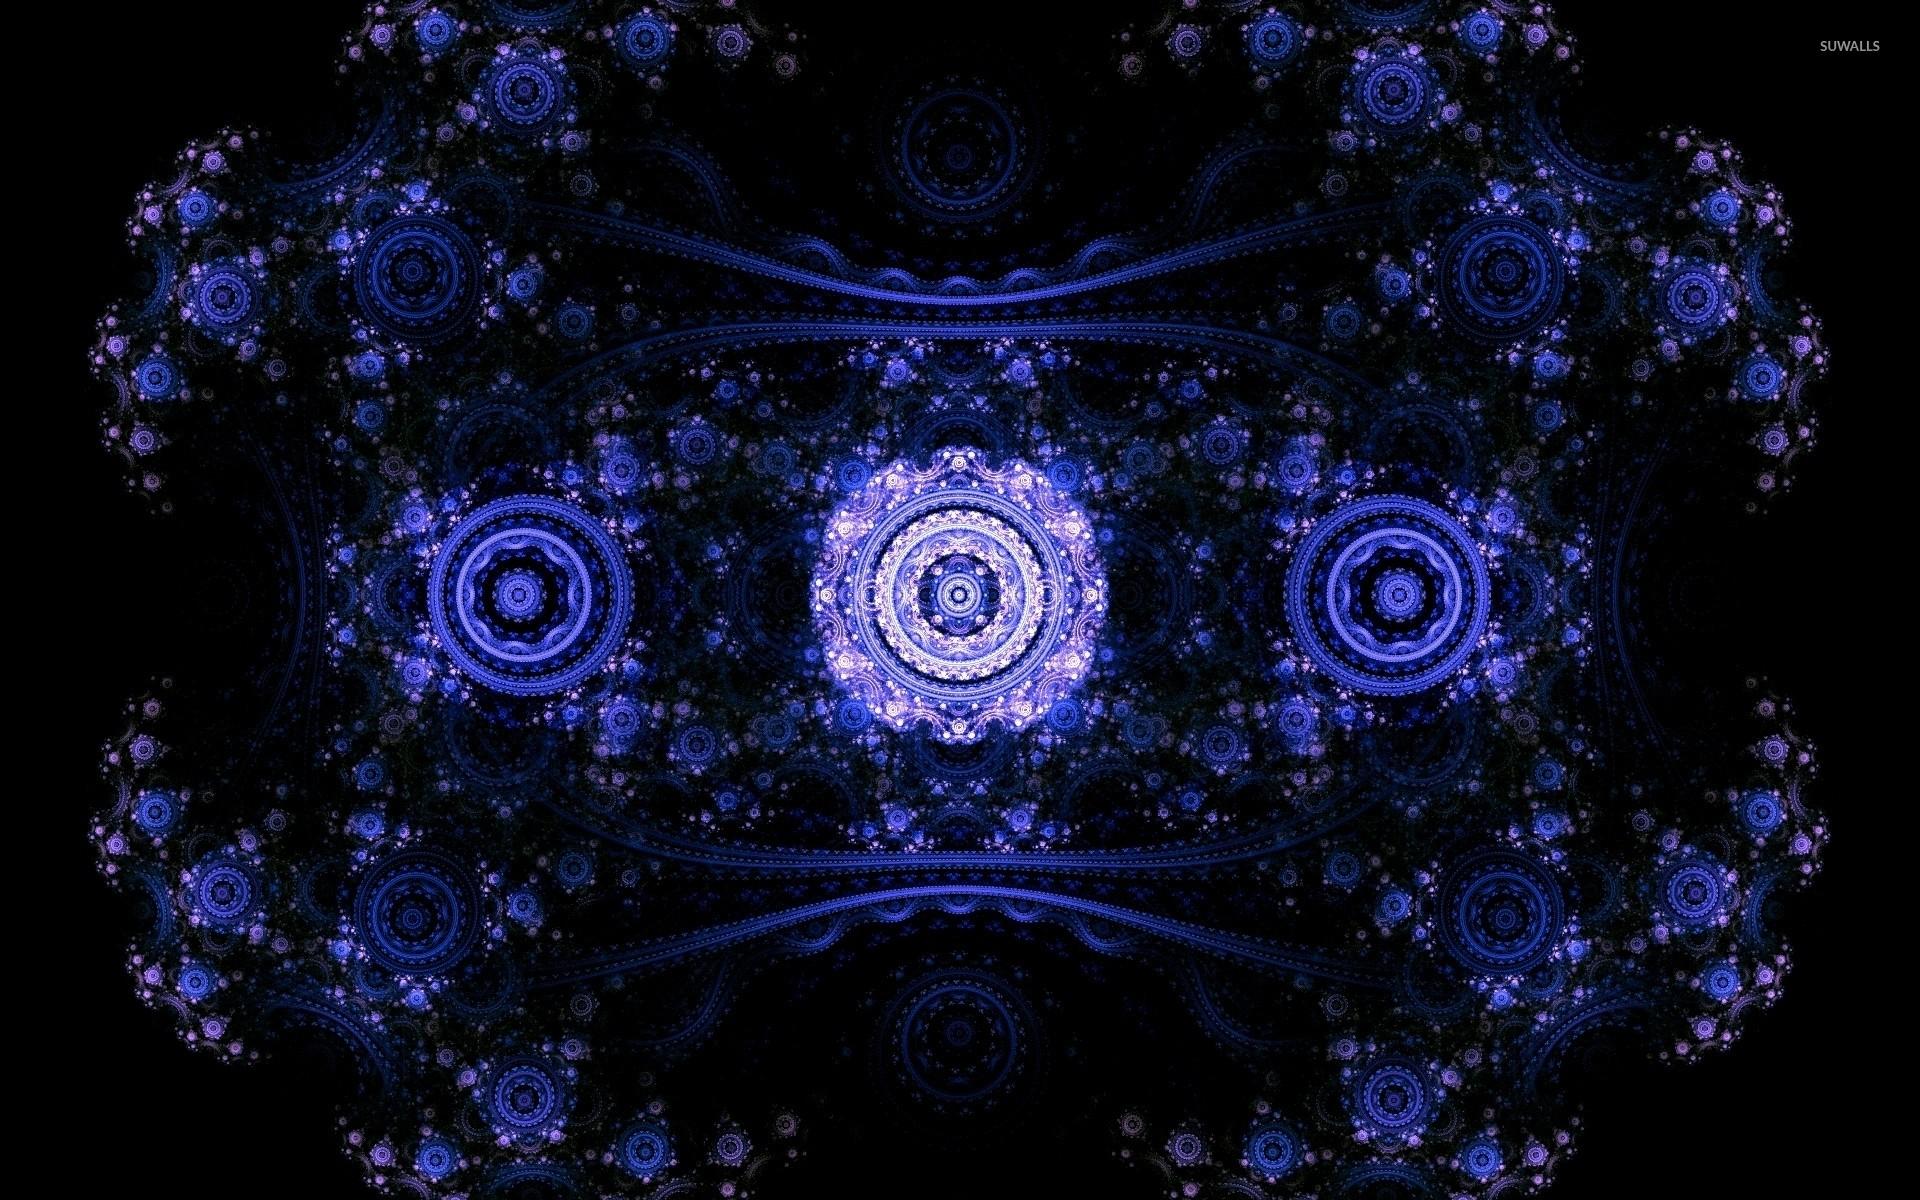 Purple fractal wallpaper jpg